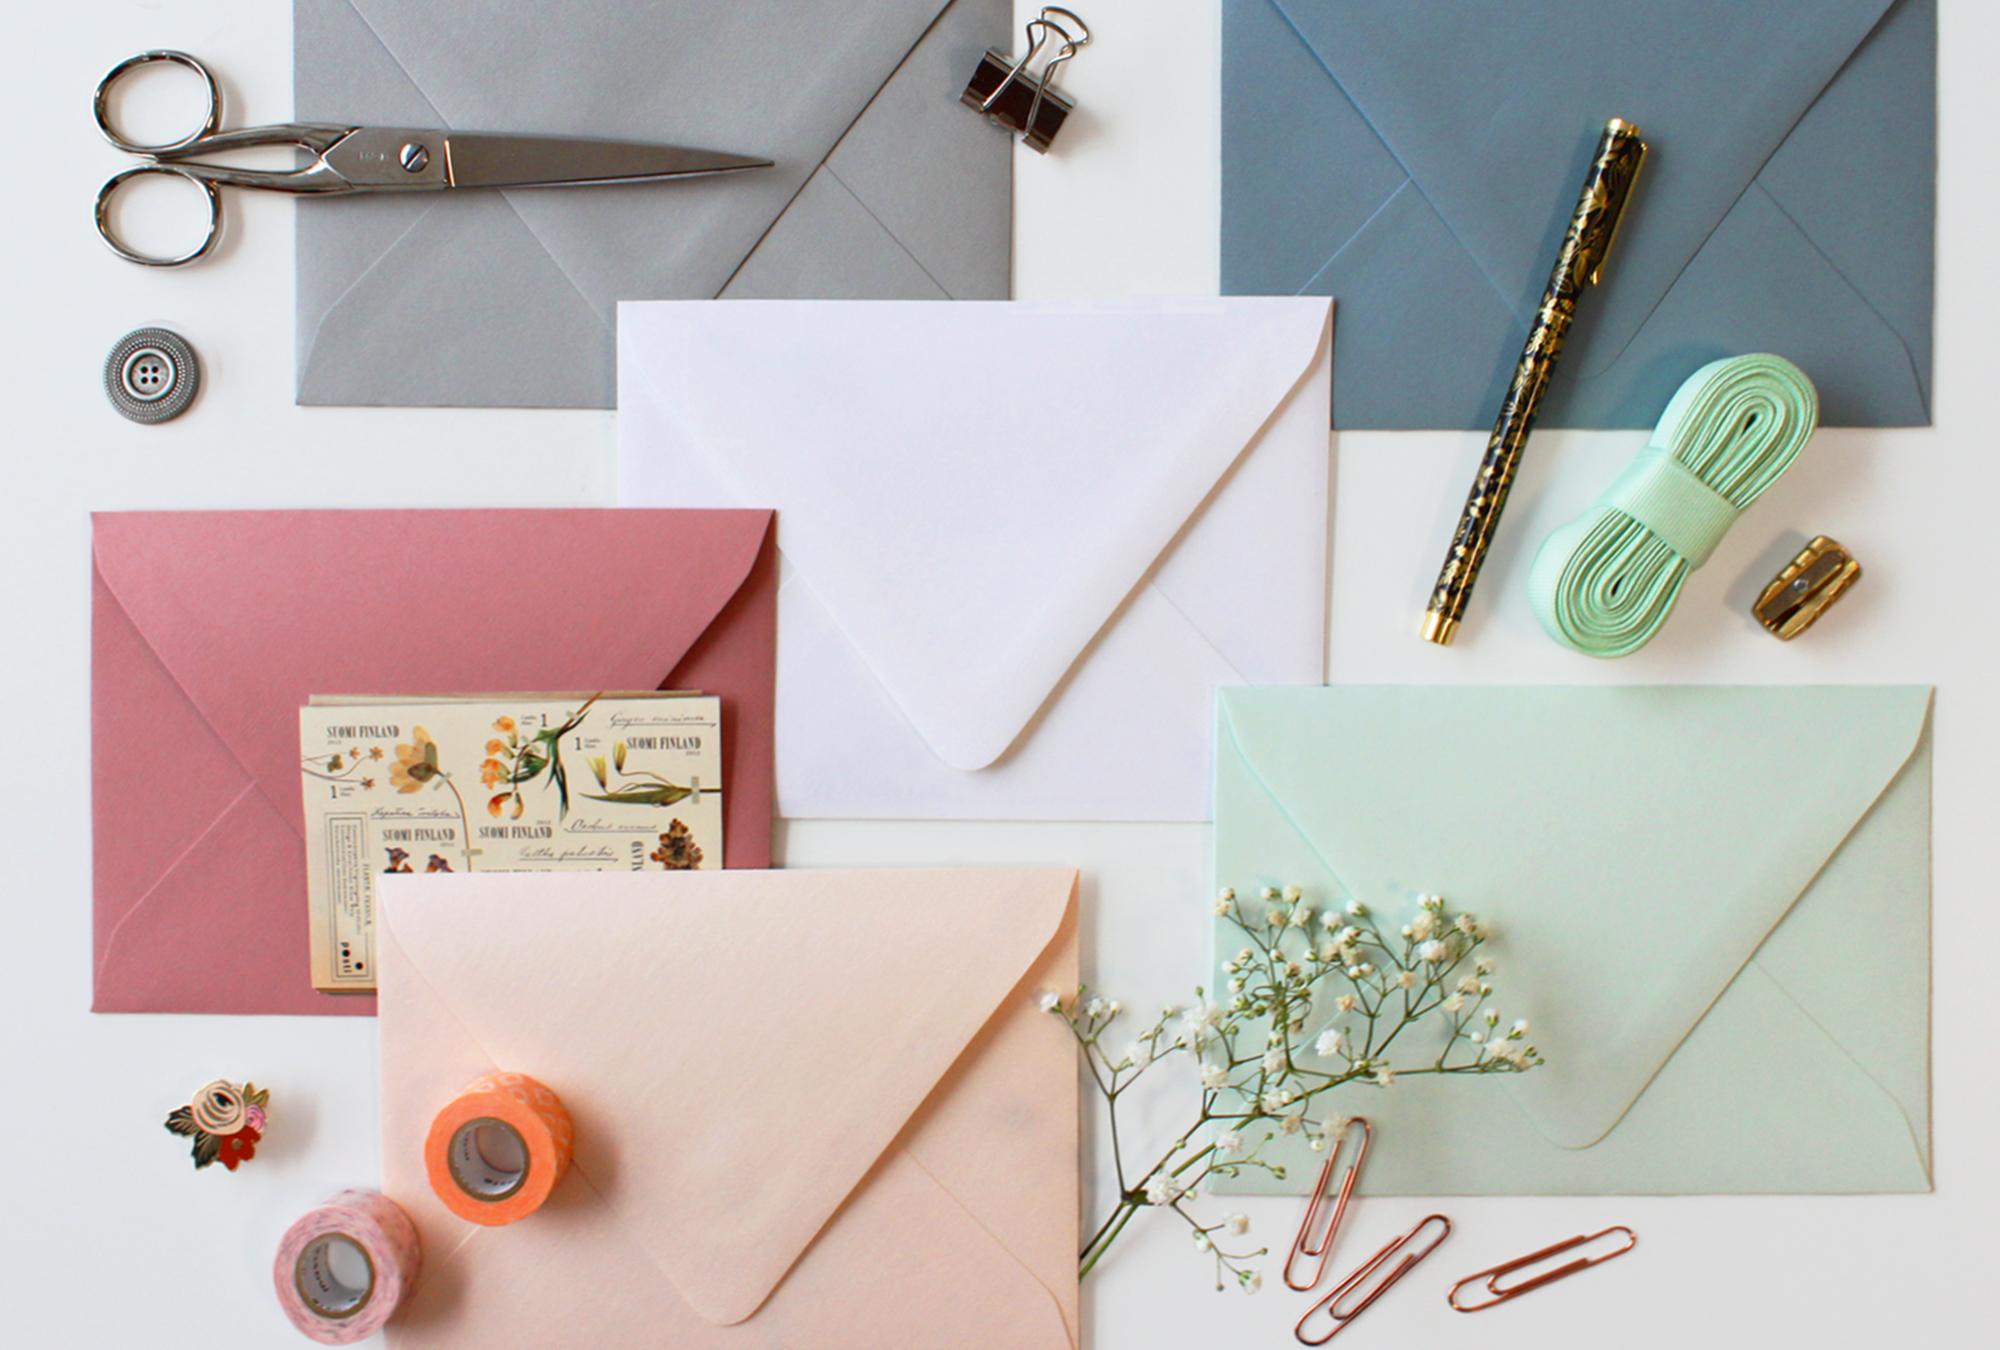 Papershop_Helsinki_Kutsuille_Kirjekuoret_Envelopes_for_Invitations